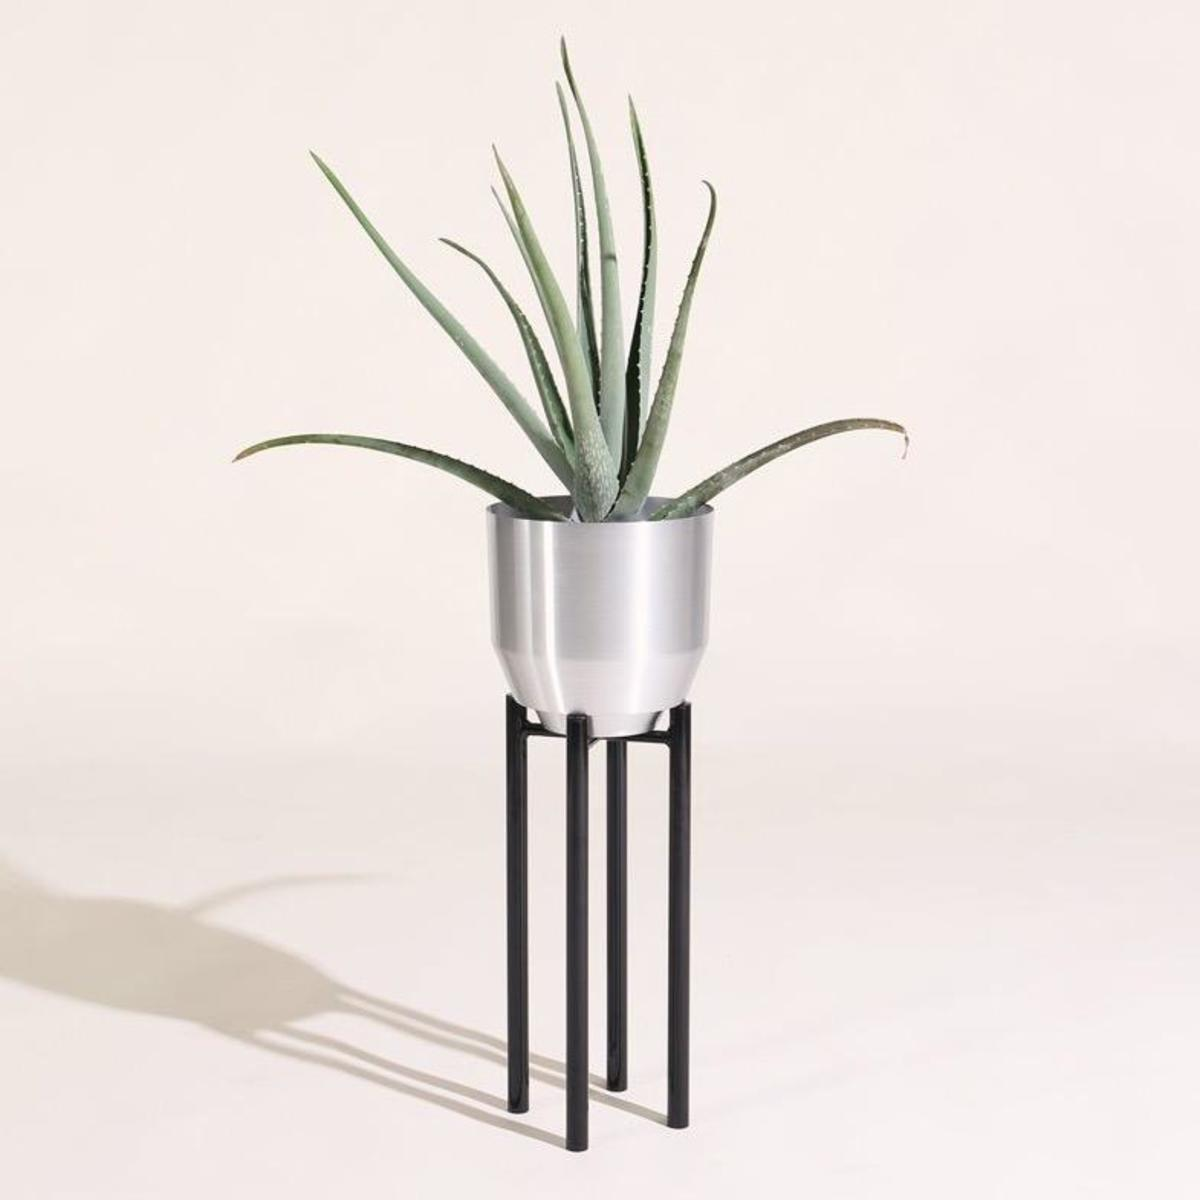 Planter-Stand-20190216052312